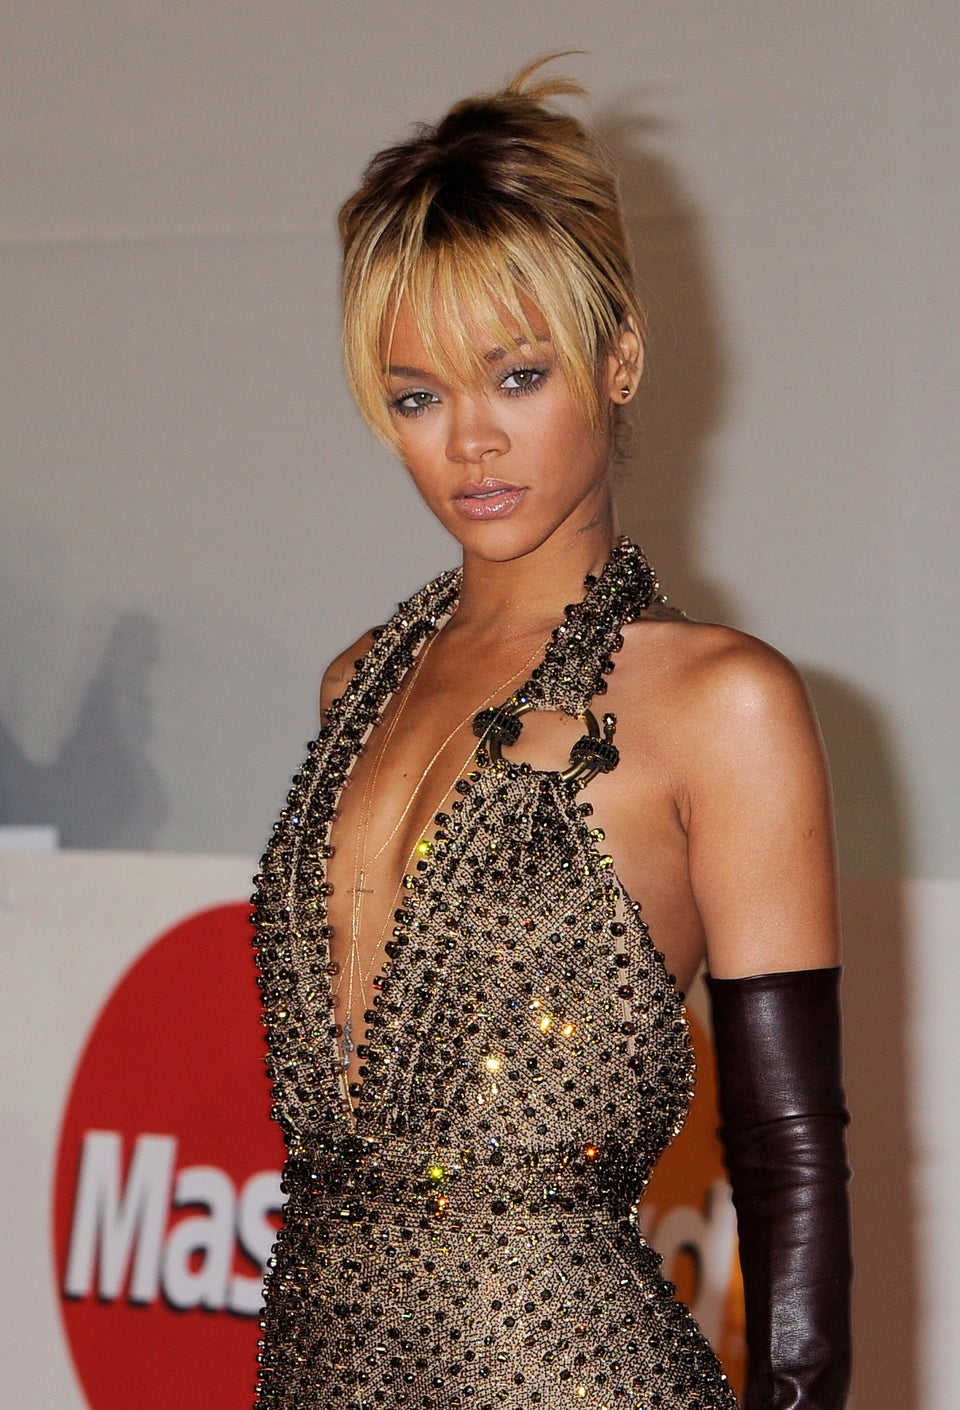 Rihanna Calls Chris Brown Collaboration 'Innocent'